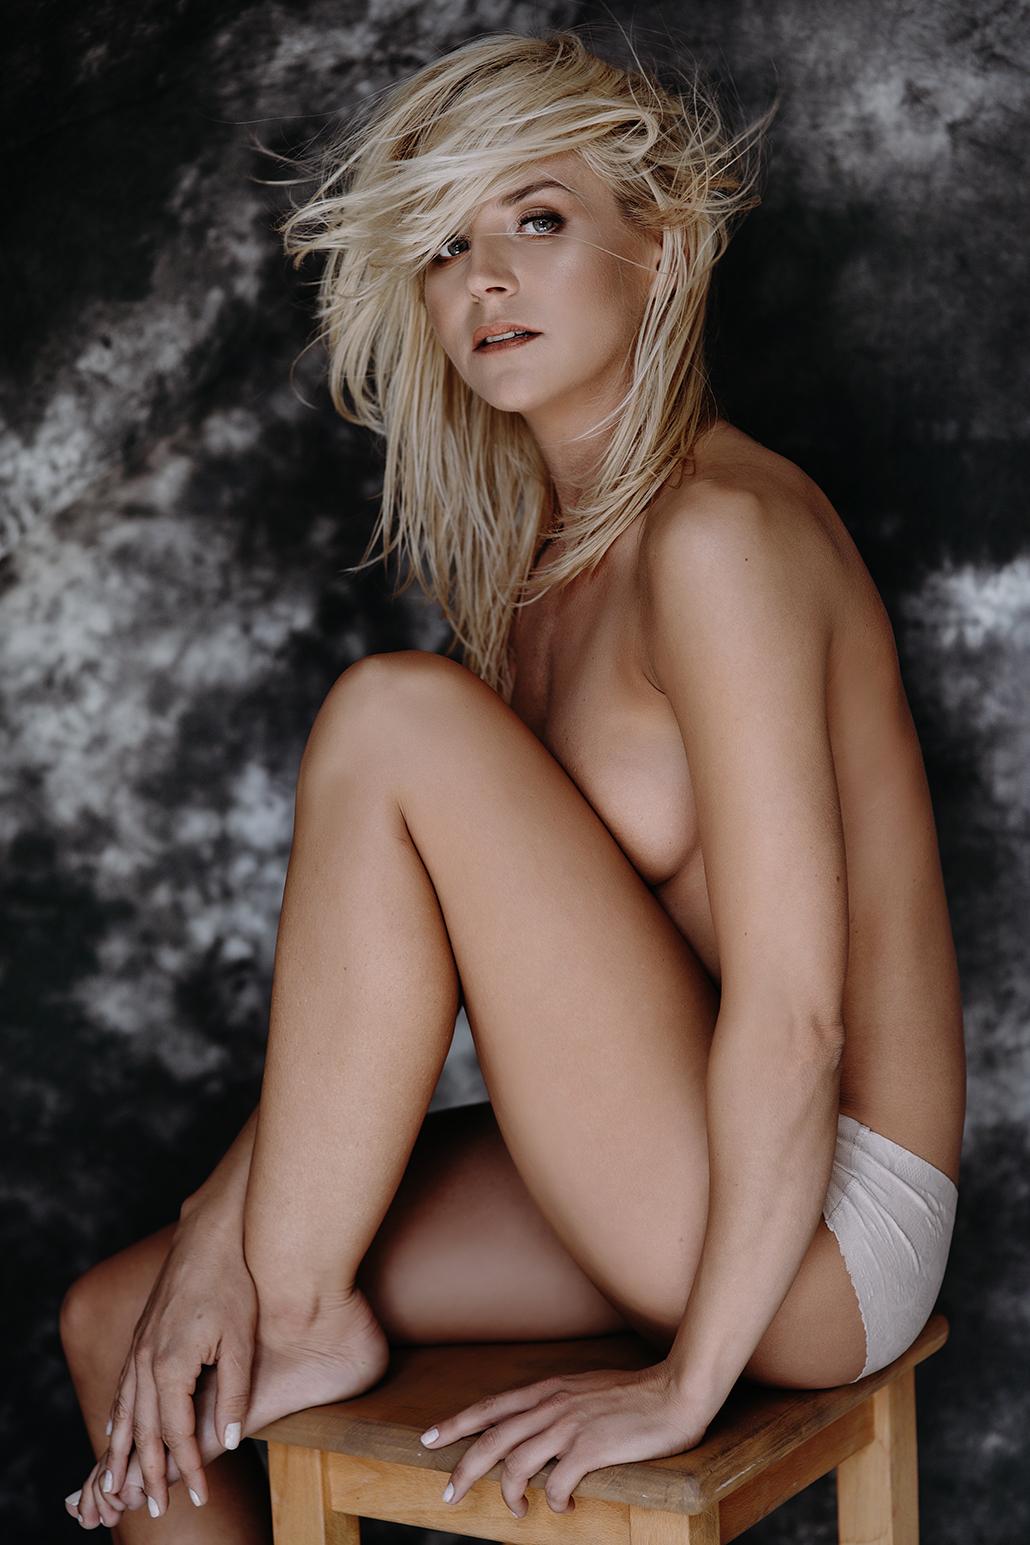 fotografia sensualna śląsk